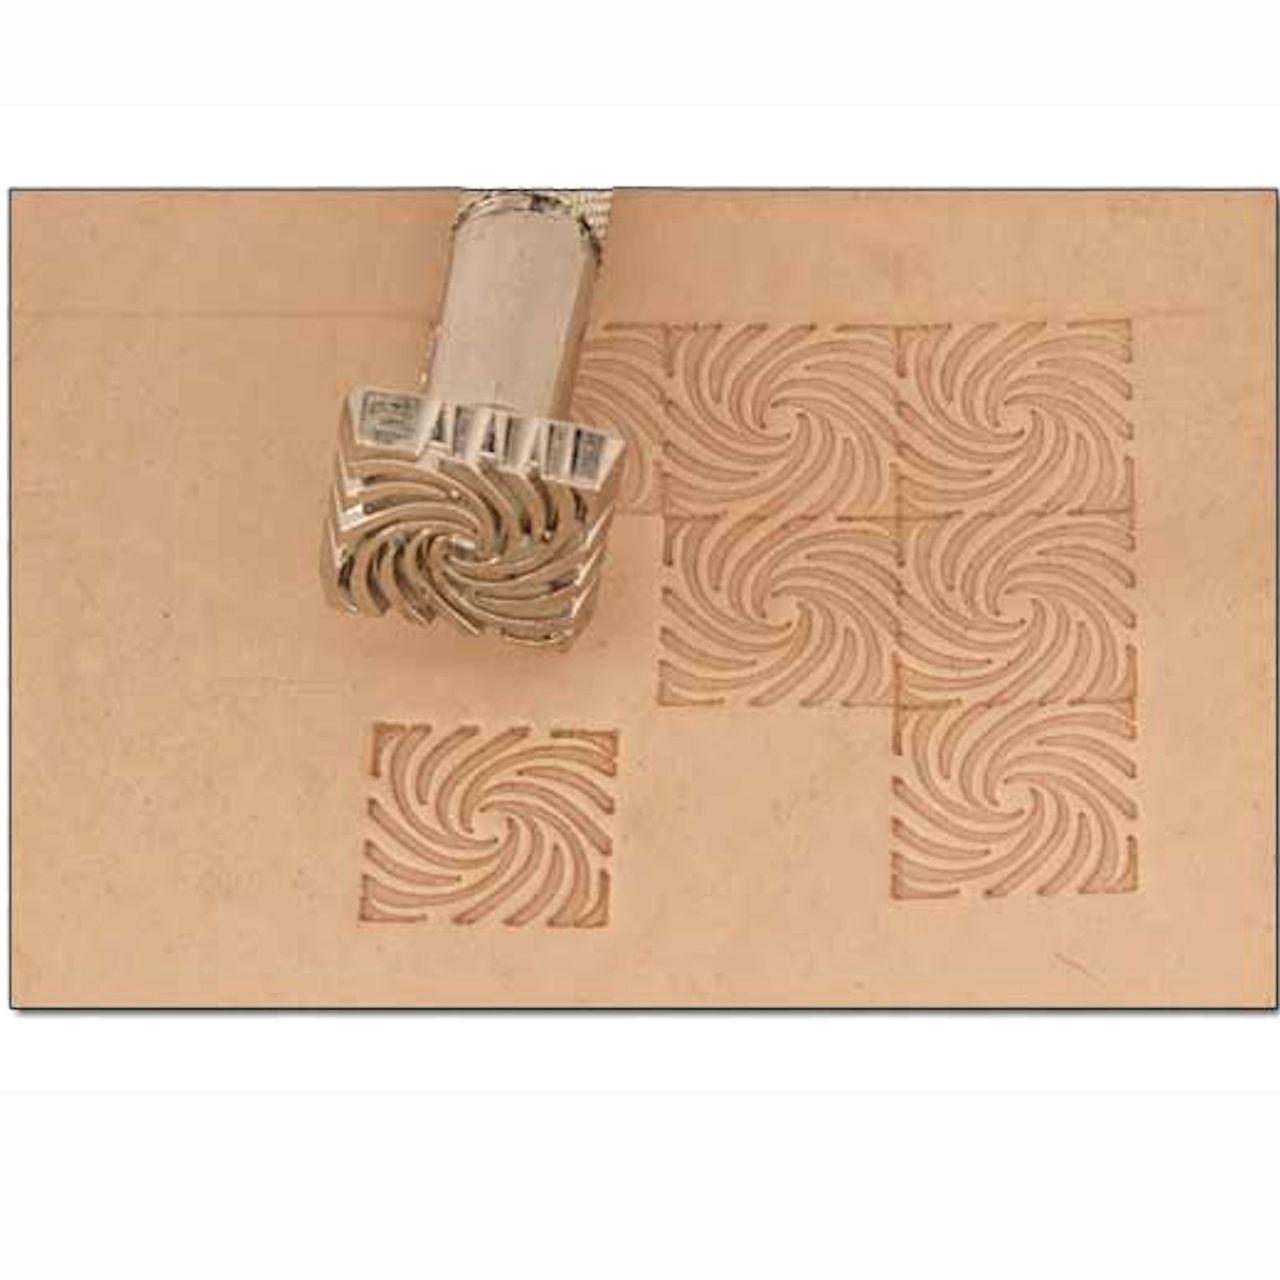 K135 Craftool Leather Stamp 66135 00 Stecksstore